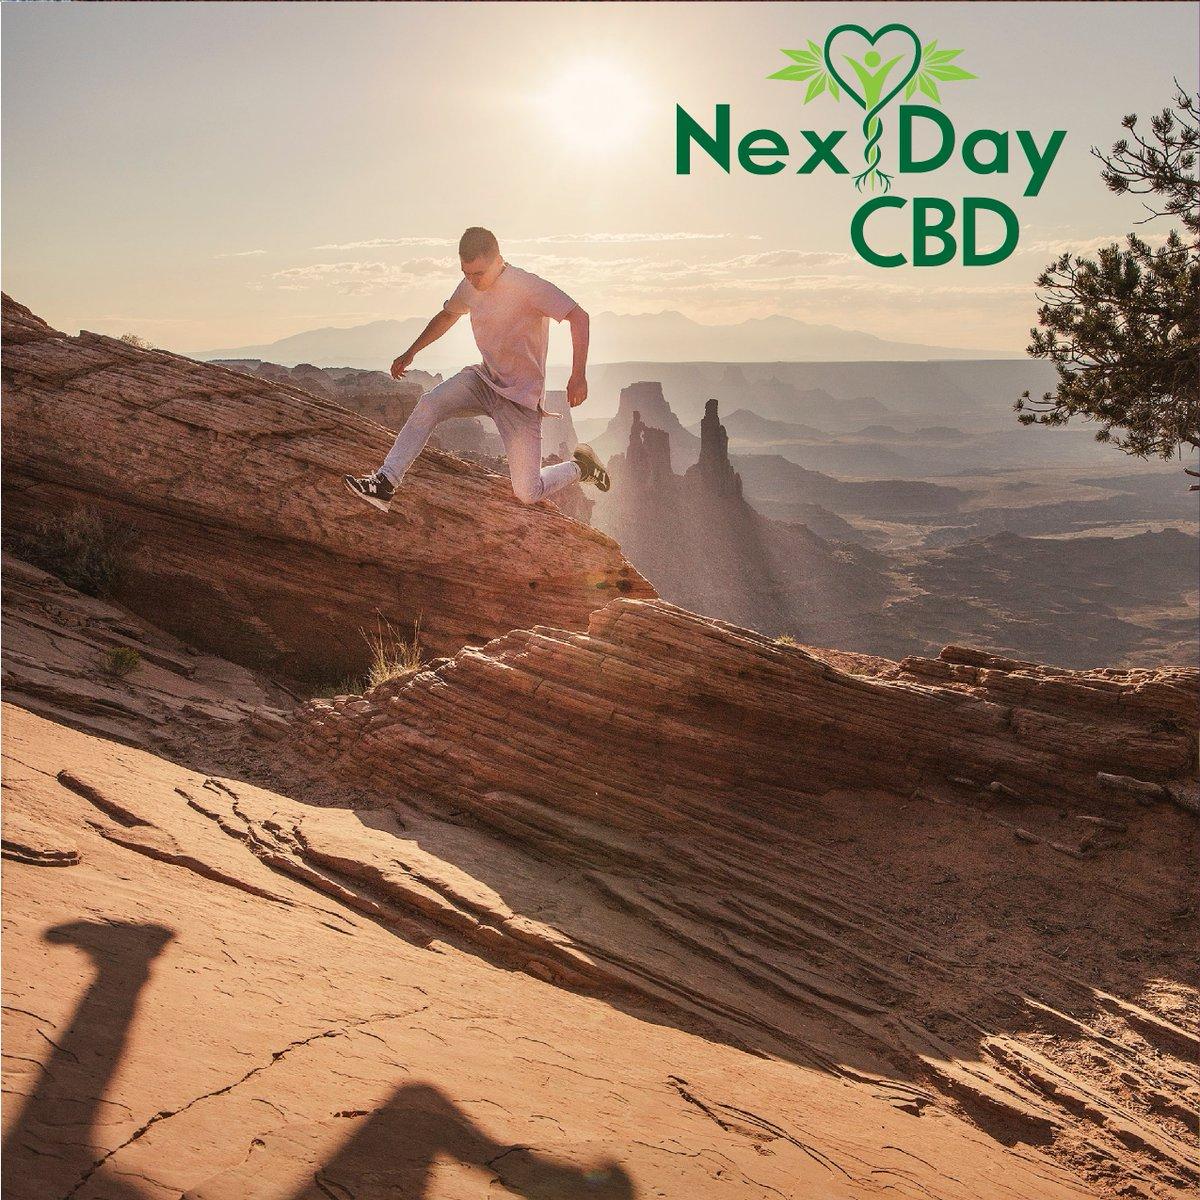 Live your life to the fullest!🤟...#cbd #cannabis #calm #cbdoil #cannabiscommunity #hemp #aging #medical #cannabidiol #cannabisculture #cbdlife #sativa #cbdhealth #tincture #cbdheals #water #weedstagram #hightimes #vape #hempoil #cbdmovement #cbdvape #kush #life #retail